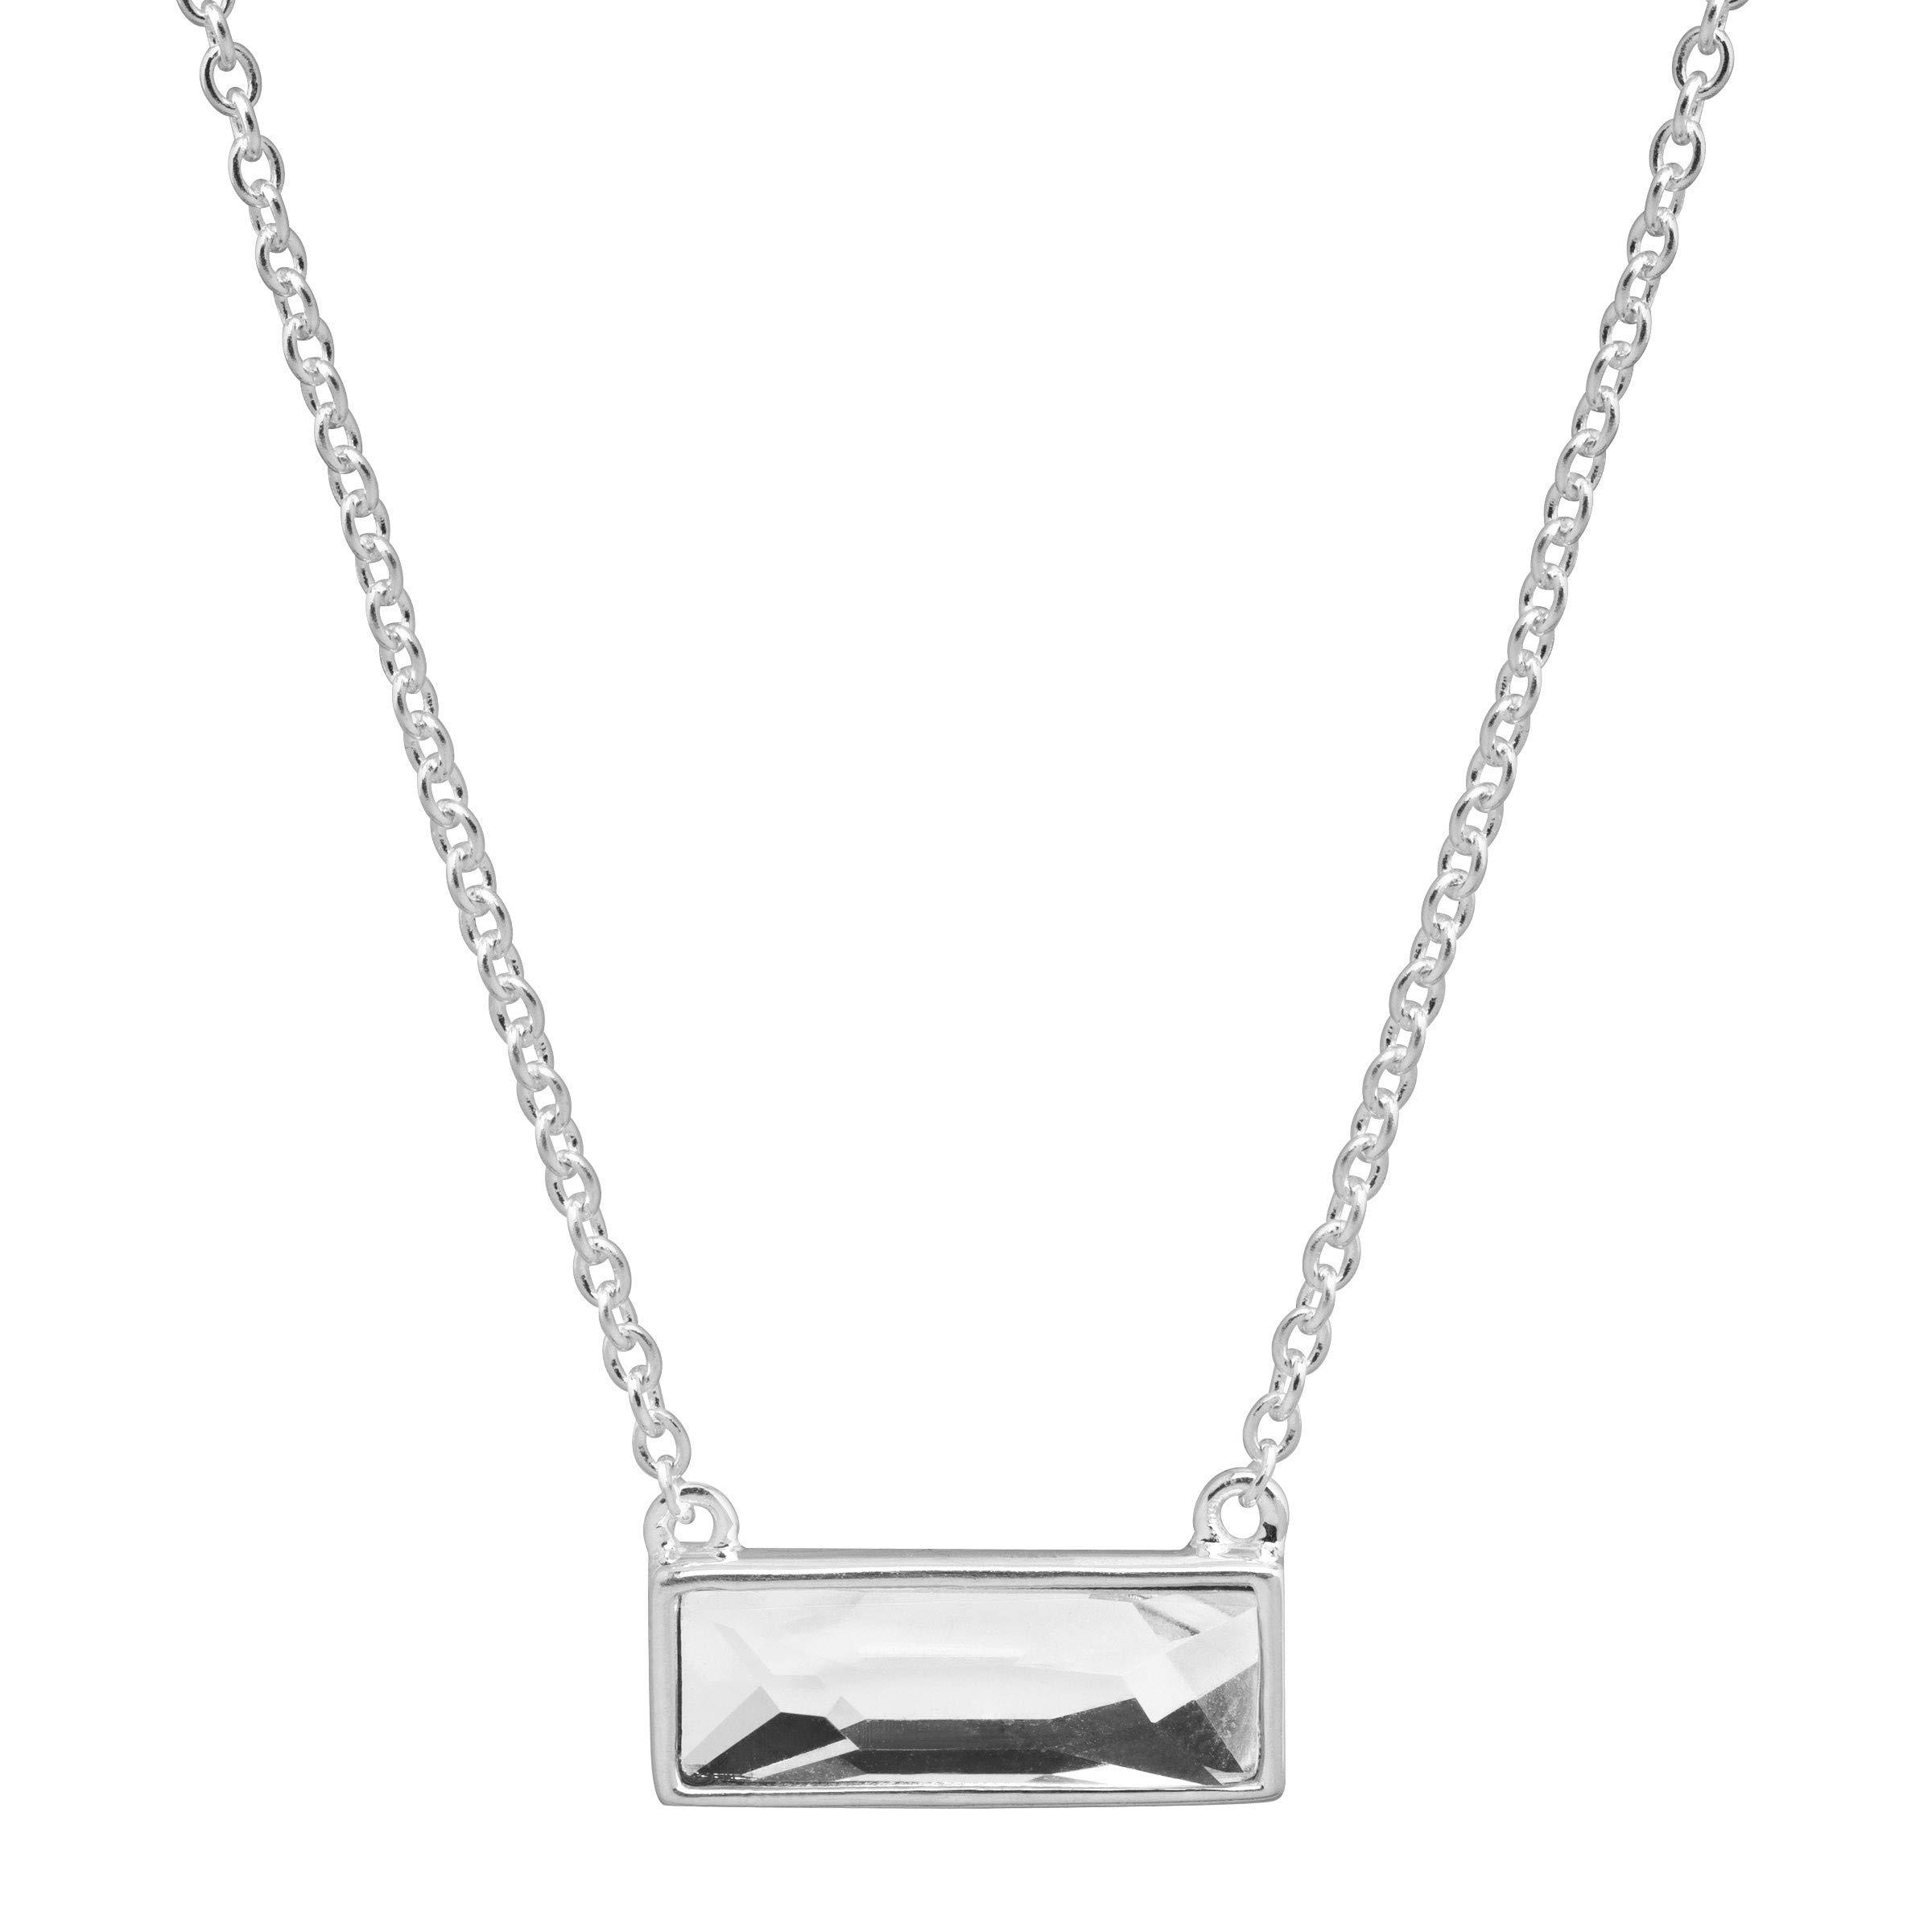 Silpada 'Soirée Not Sorry' Petite White Swarovski Crystal Necklace in Sterling Silver